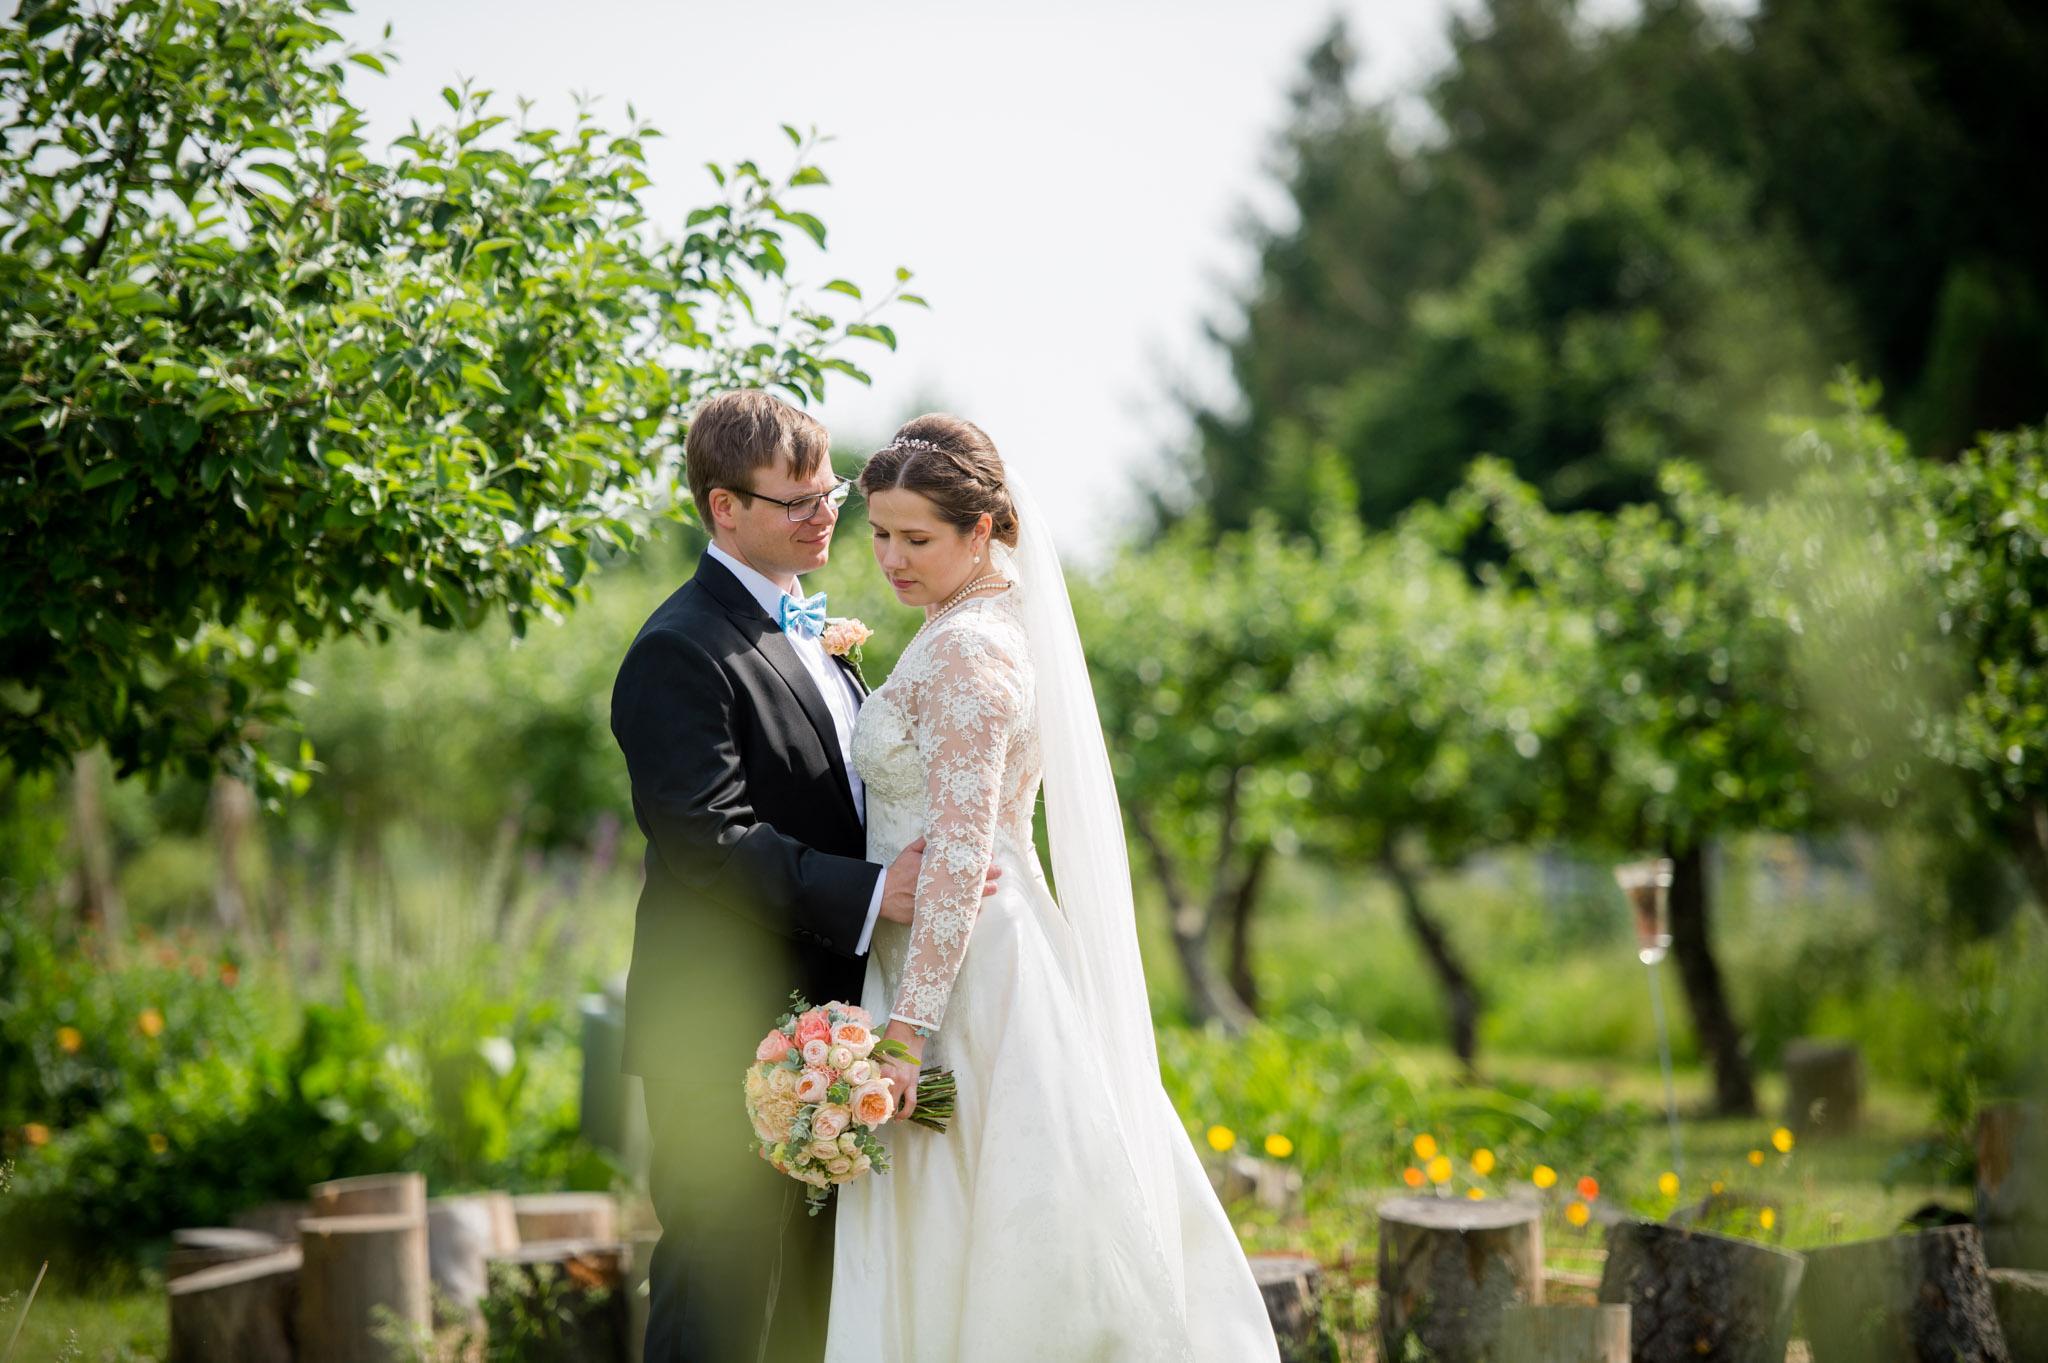 bryllupsfotograf-tønsberg-nøtterøy-fotograf-tjøme-vestfold-oslo-fotografvarpe--5985.JPG